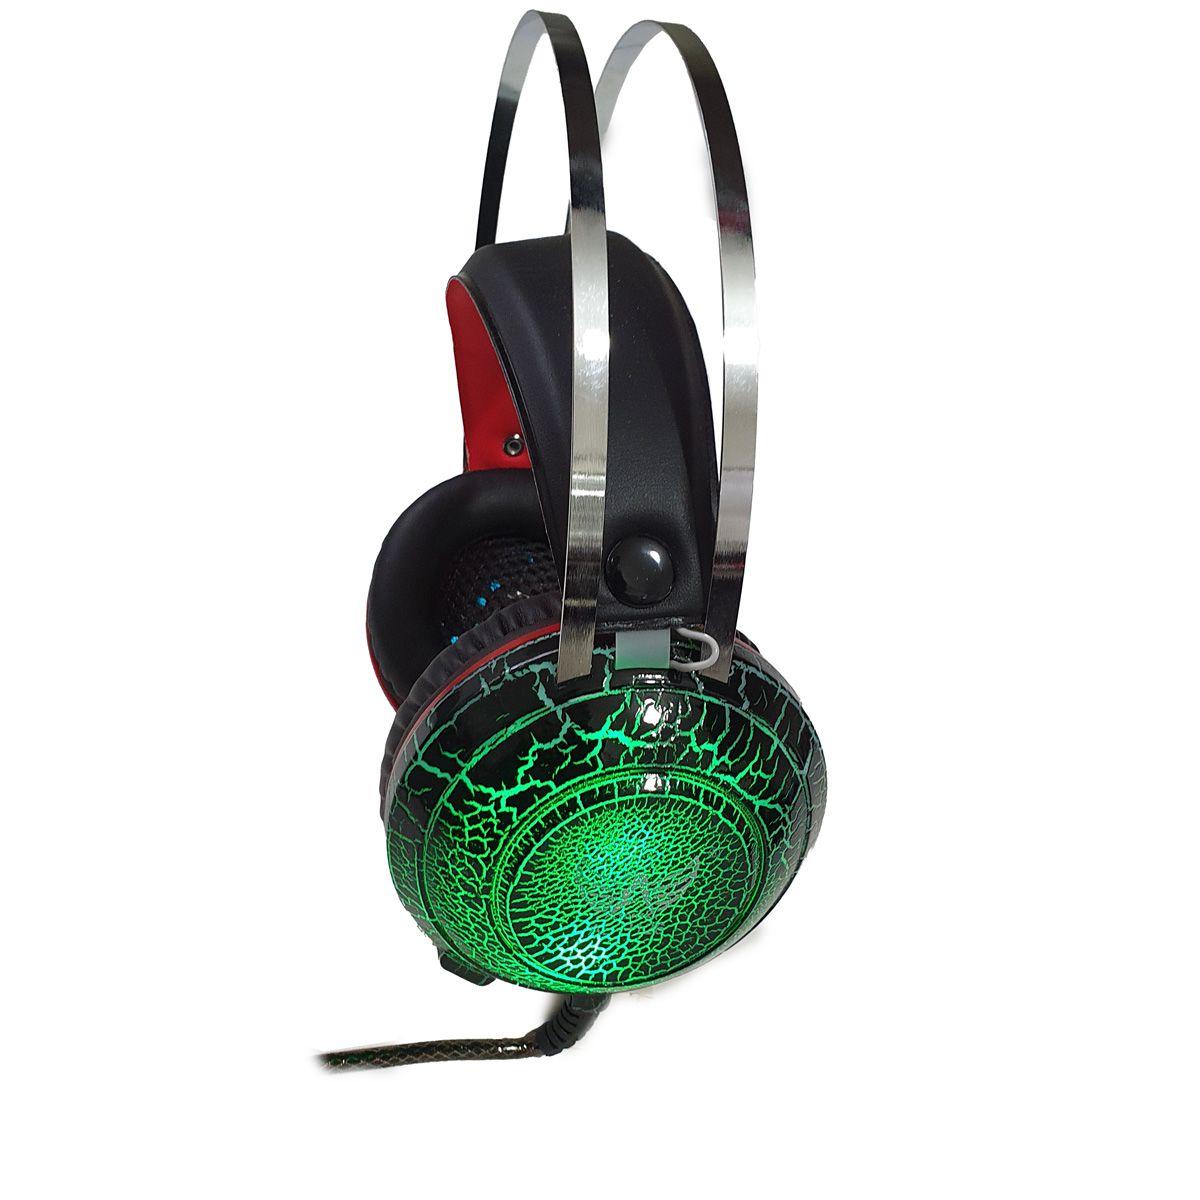 Fone Headset Gamer com Microfone Altomex AL-H138